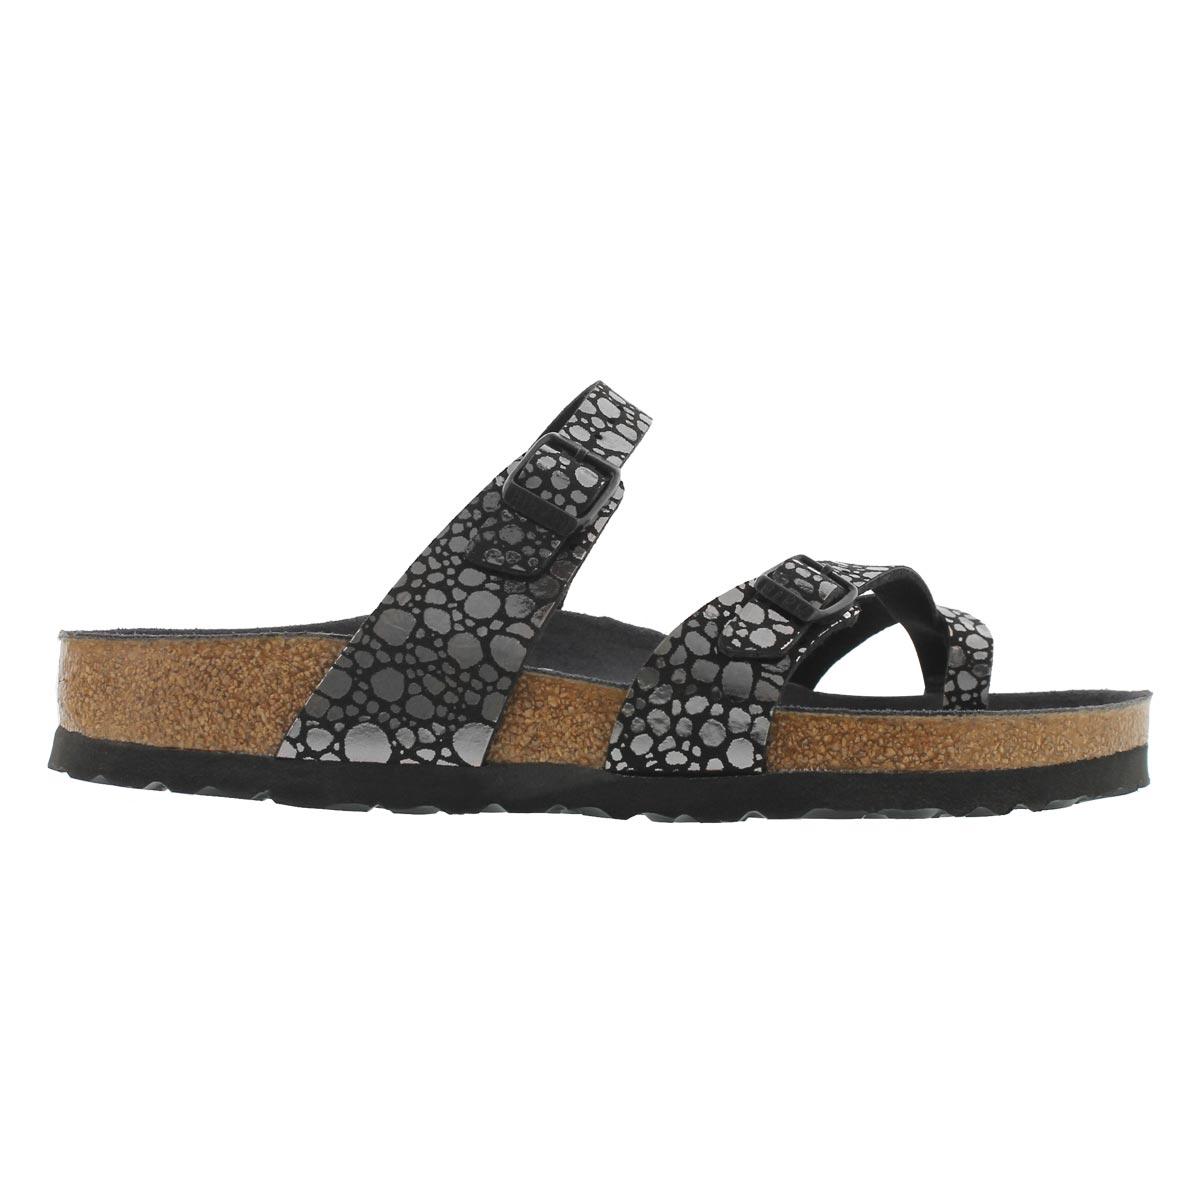 Sandale MayariBF, galets noir mét, fem